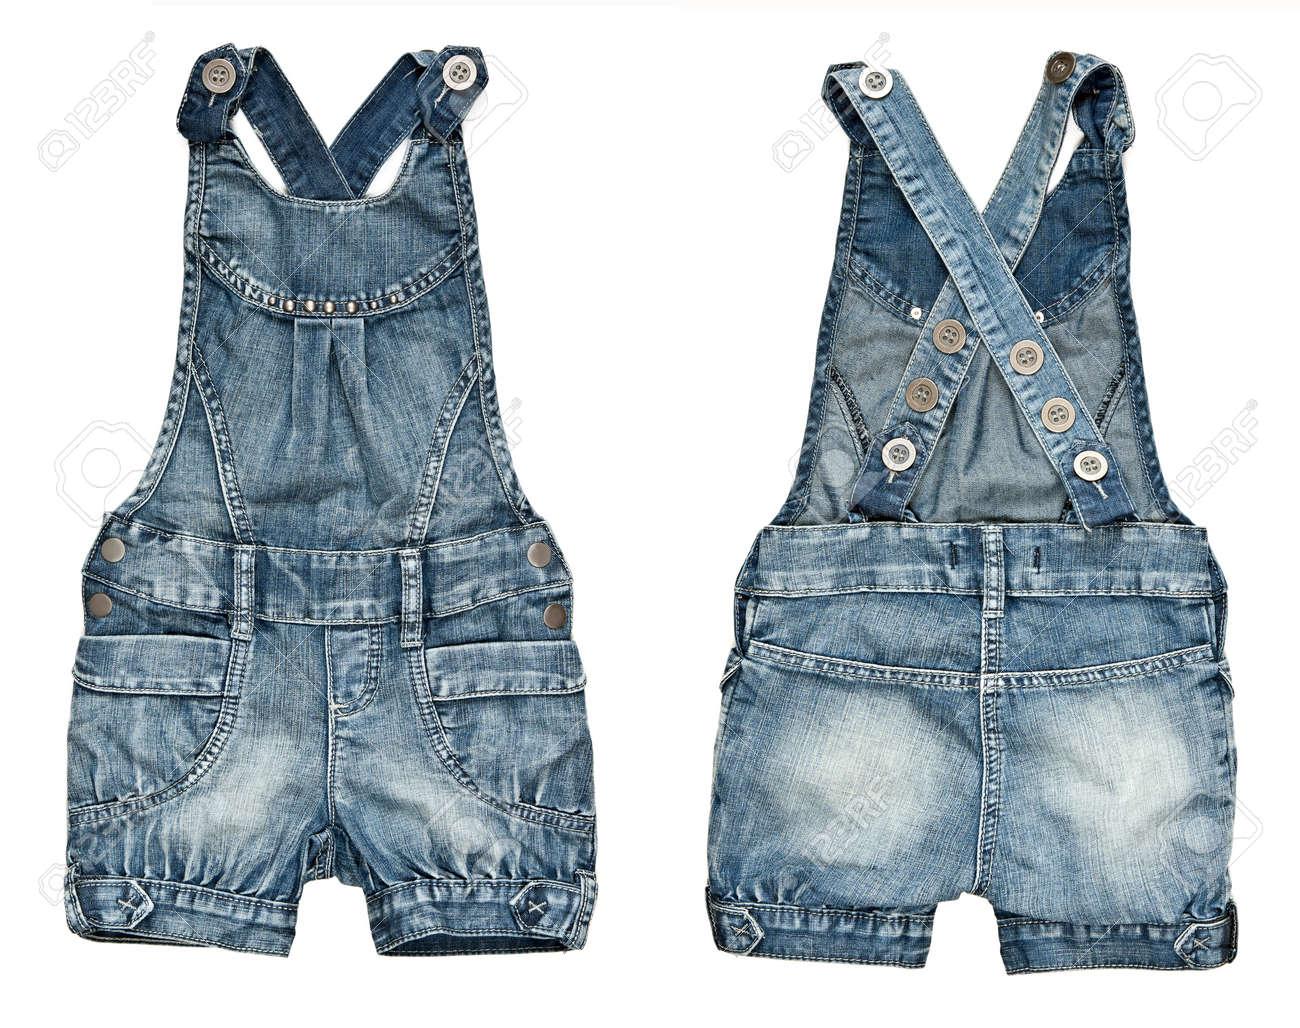 e6ad48762d Collage pantalones cortos de mezclilla para niños con tirantes sobre un  fondo blanco. imagen se